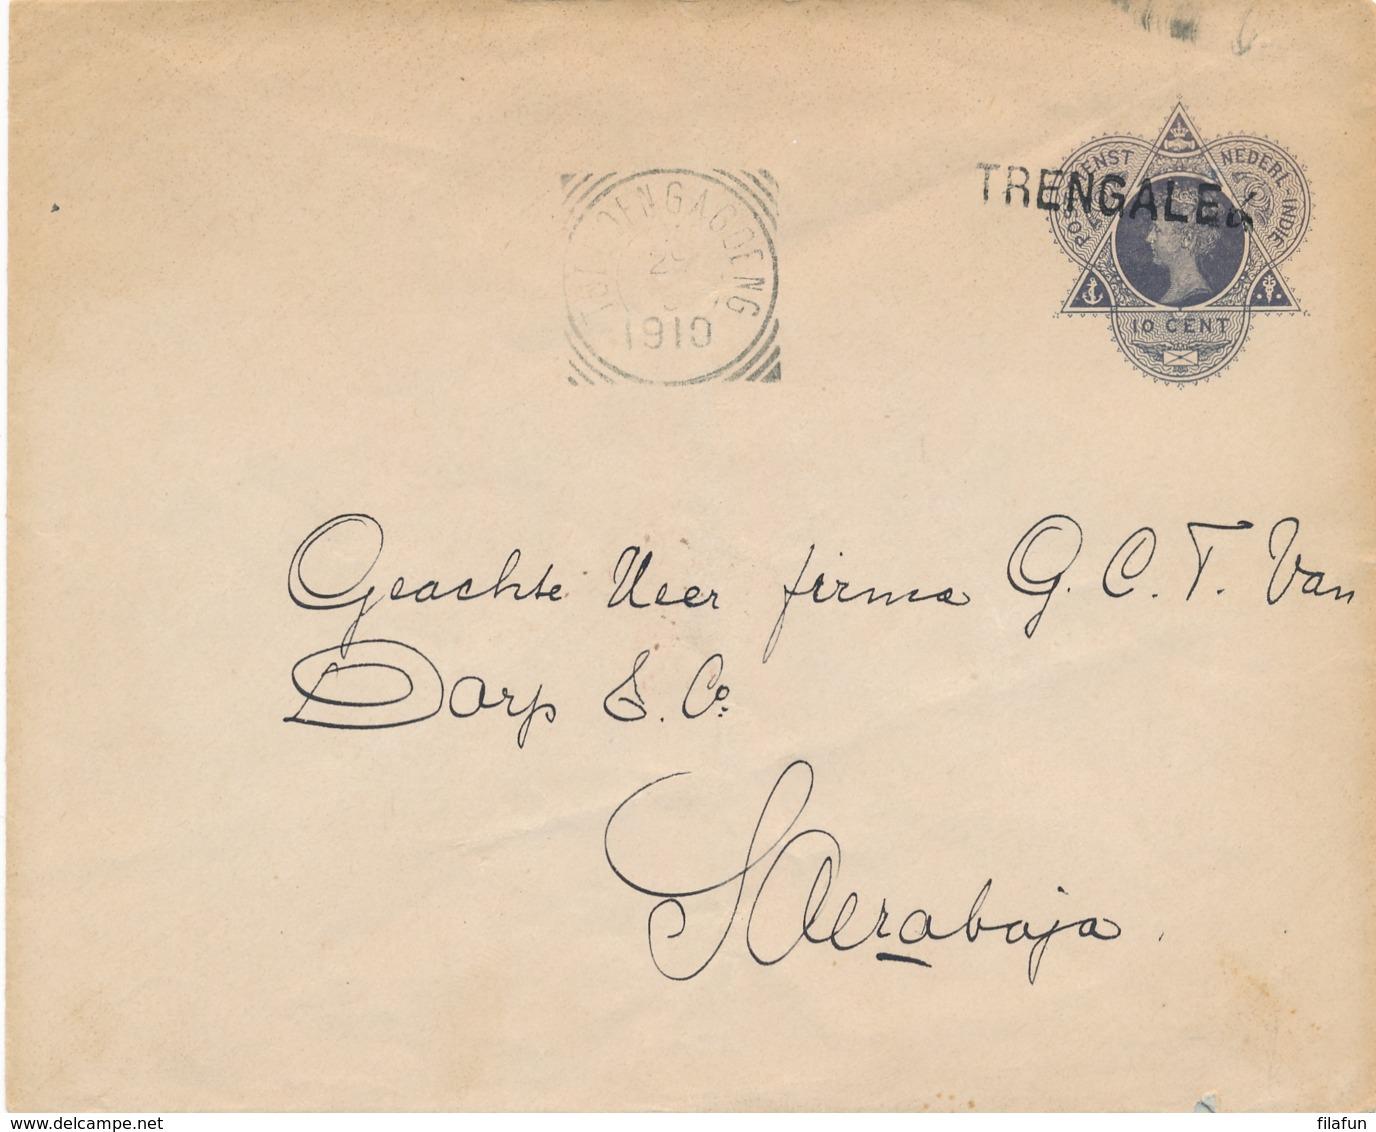 Nederlands Indië - 1910 - 10 Cent Envelop Van L TRENGALEK Via VK TOELOENGAGOENG Naar Soerabaja - Nederlands-Indië